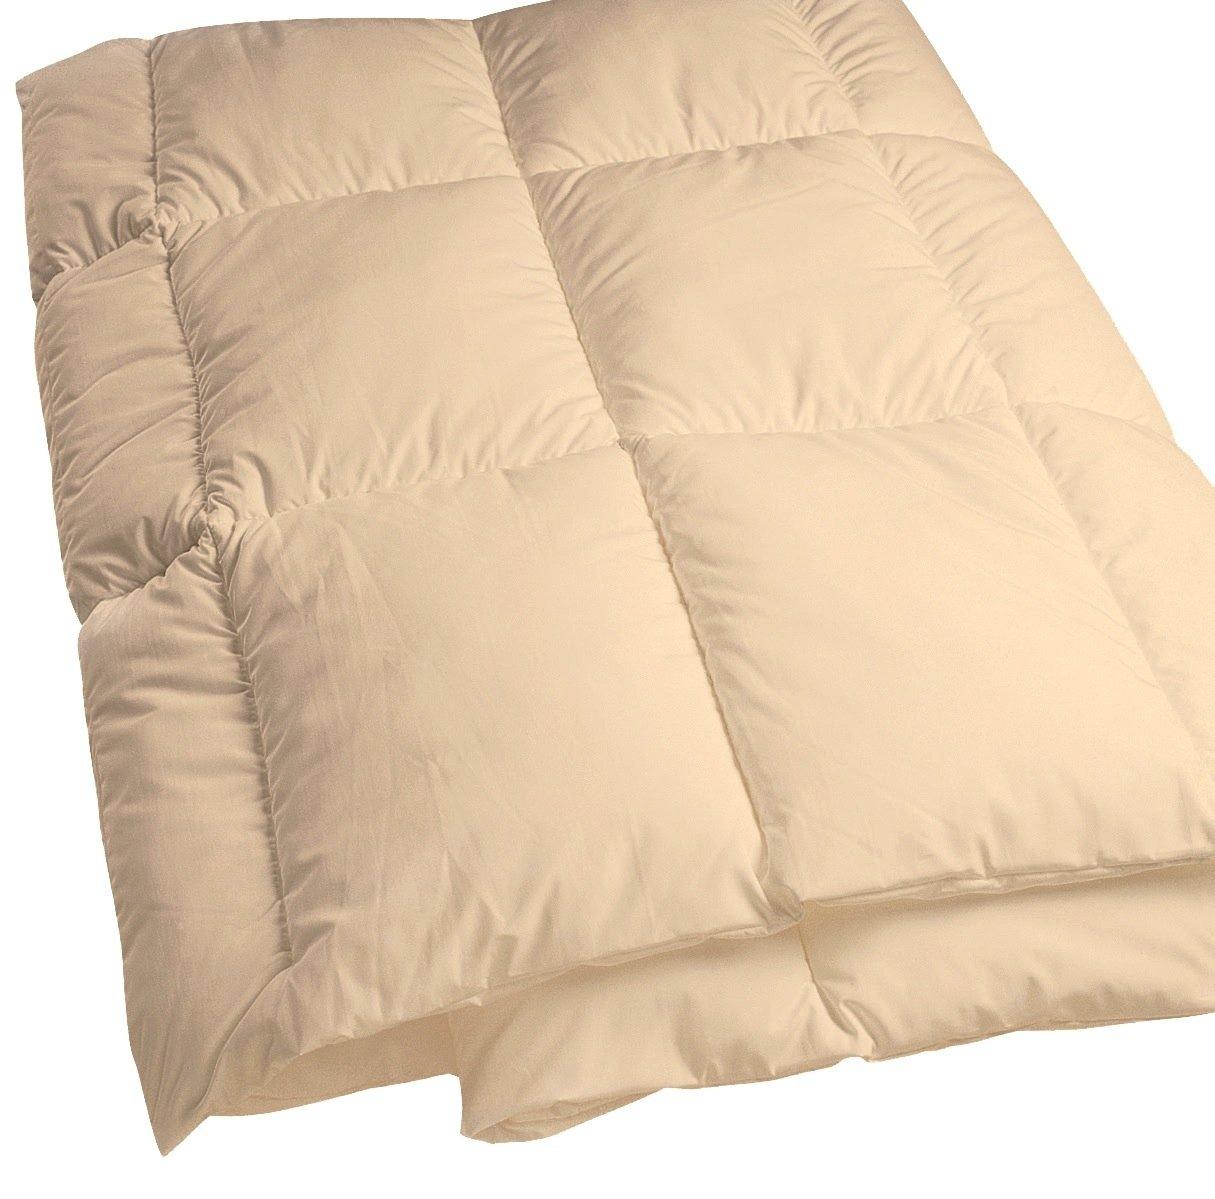 "Dust Mite- and Allergen-Proof Comforter; ""DreamFill / Premium Microfiber"" (Queen; Natural cream color)"